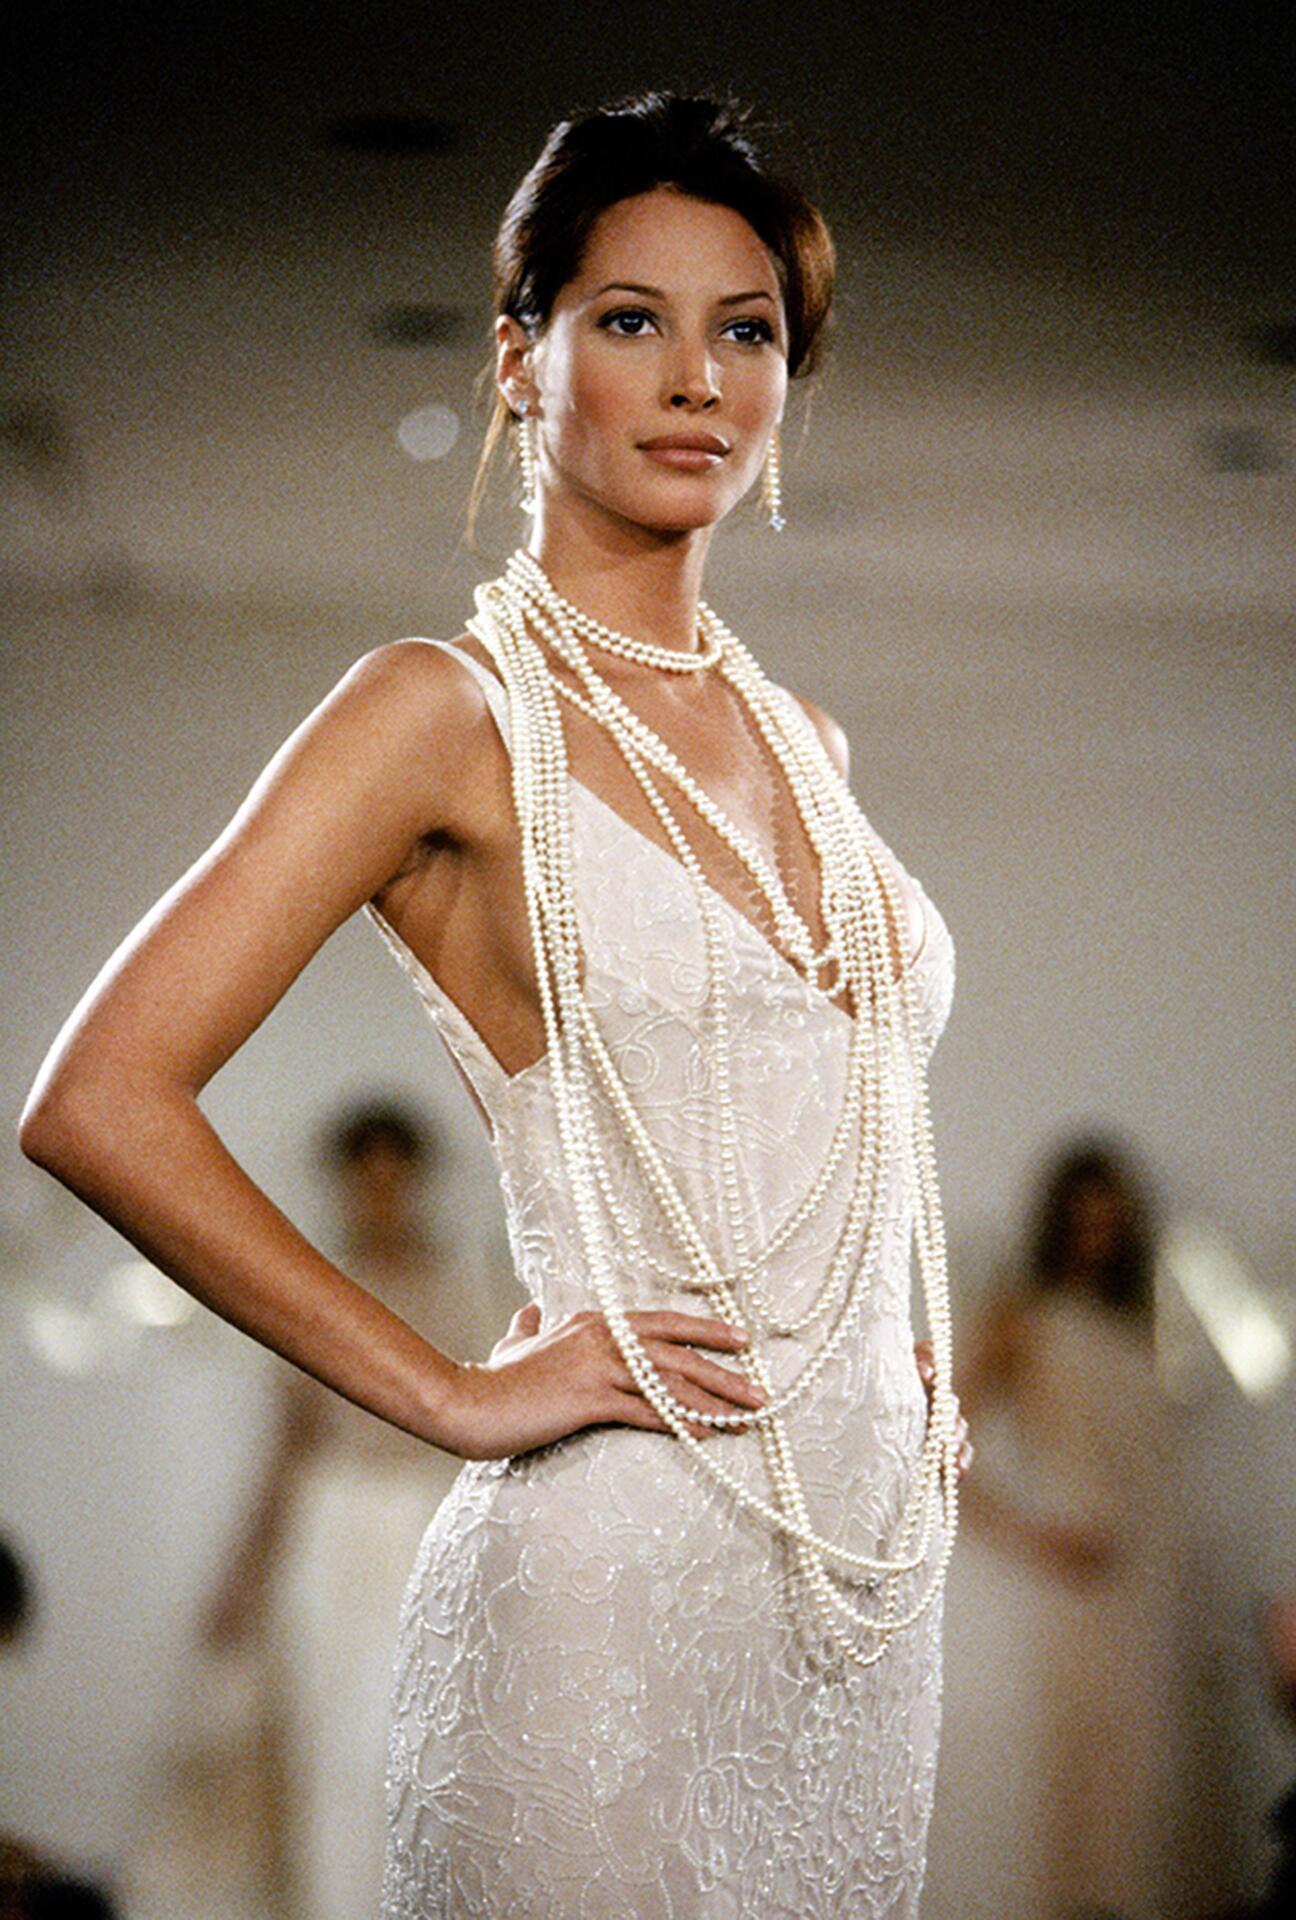 Bild zu Christy Turlington, Model, 90er